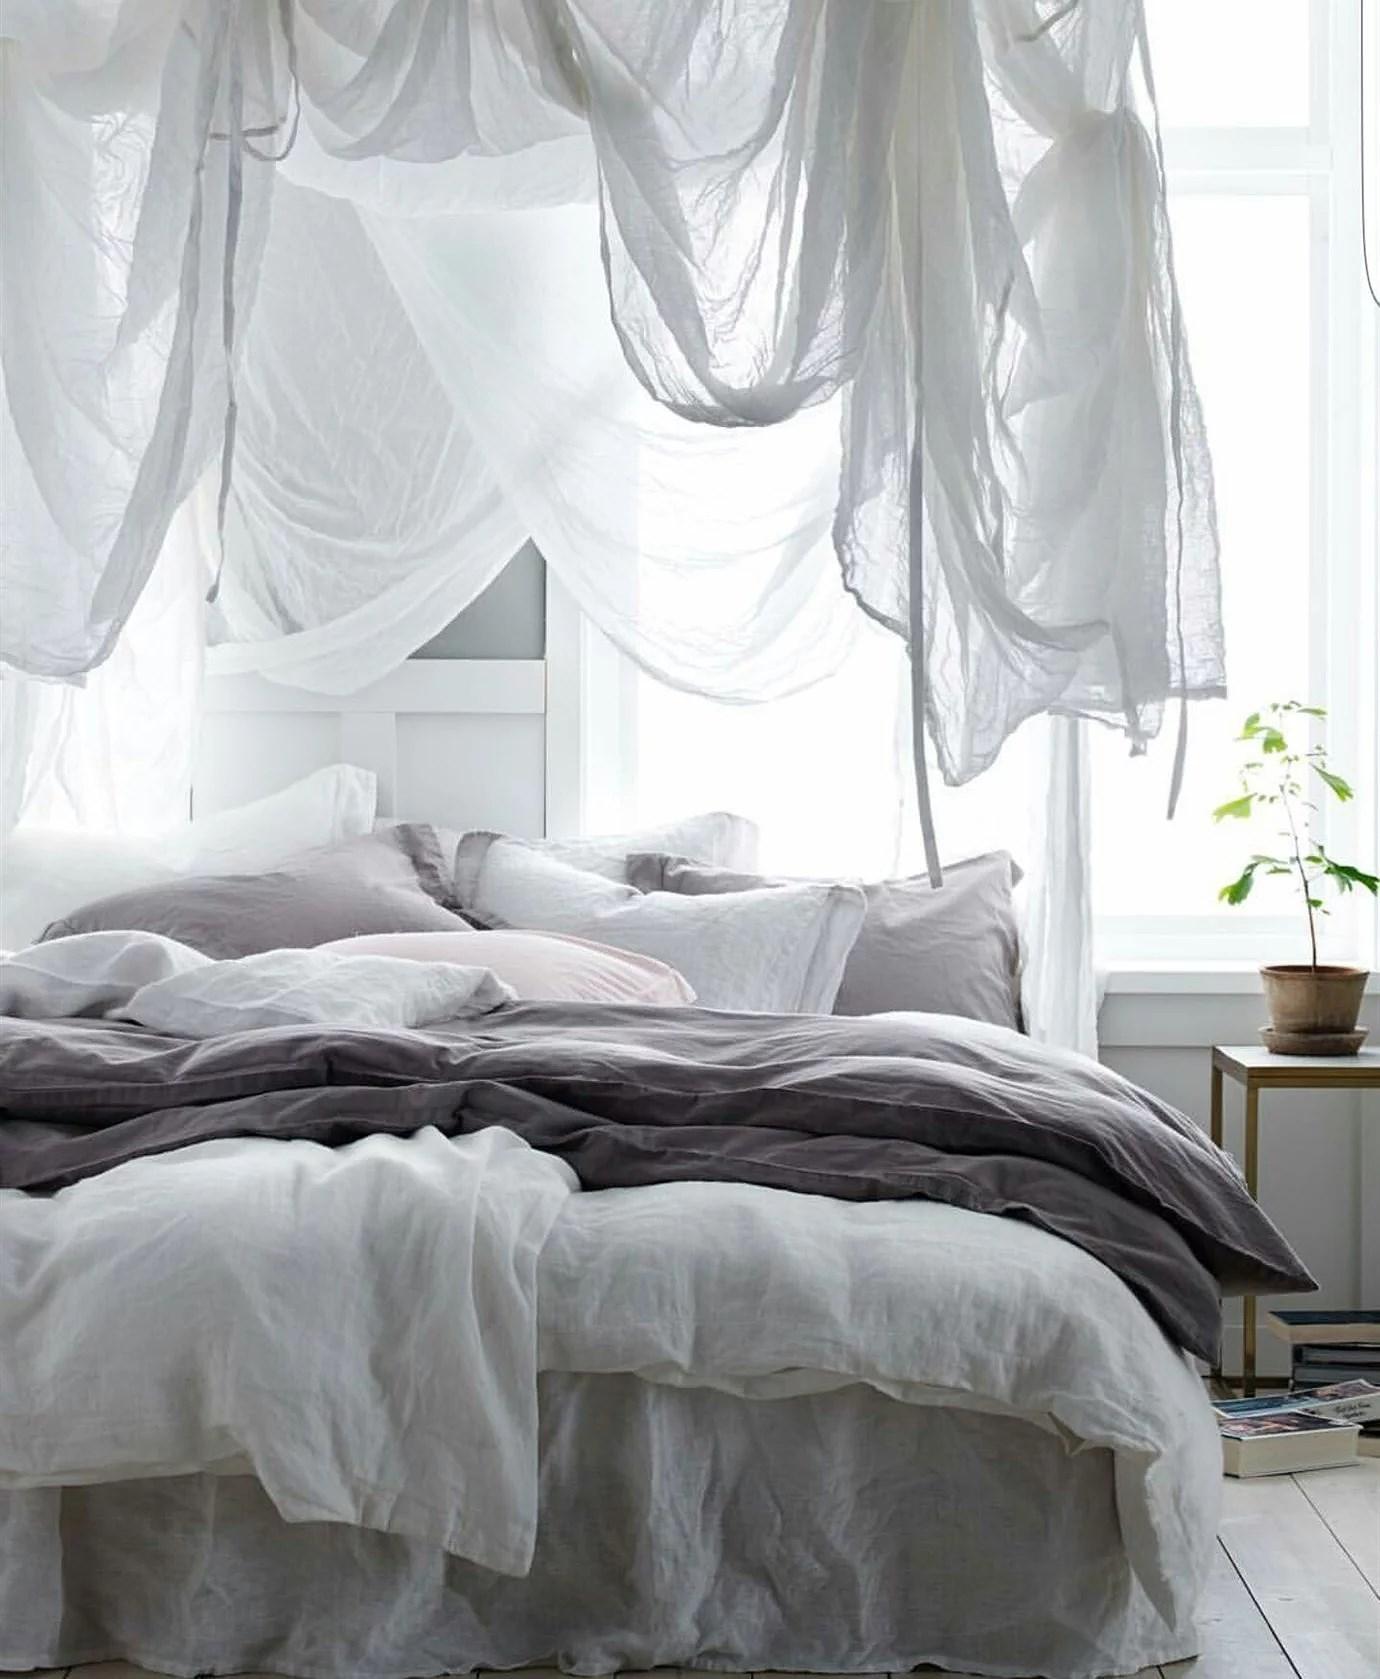 Textilier till nya/fd huset